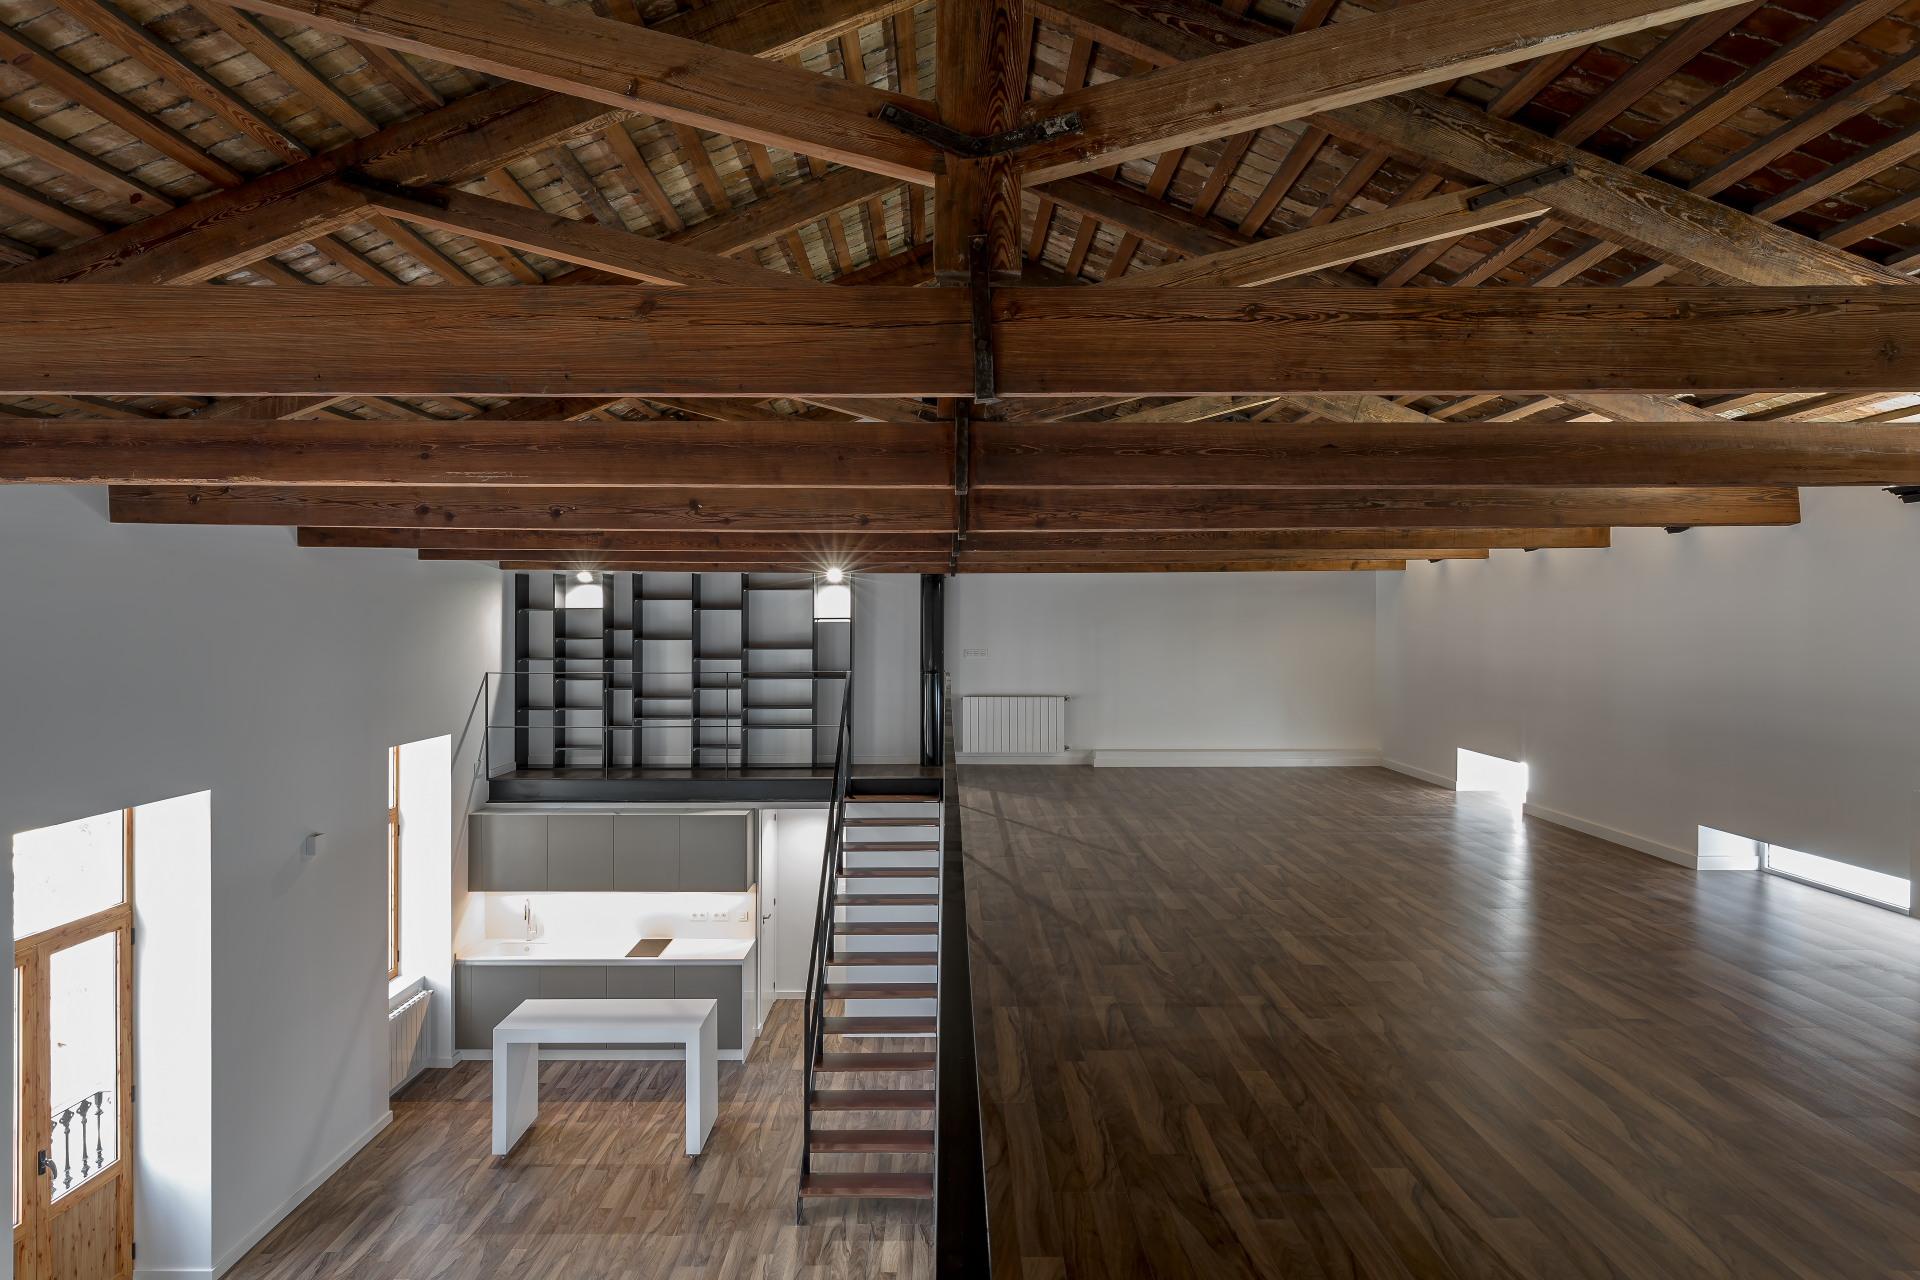 fotografia-arquitectura-valencia-german-cabo-viraje-rehabilitacion-campanar (25)